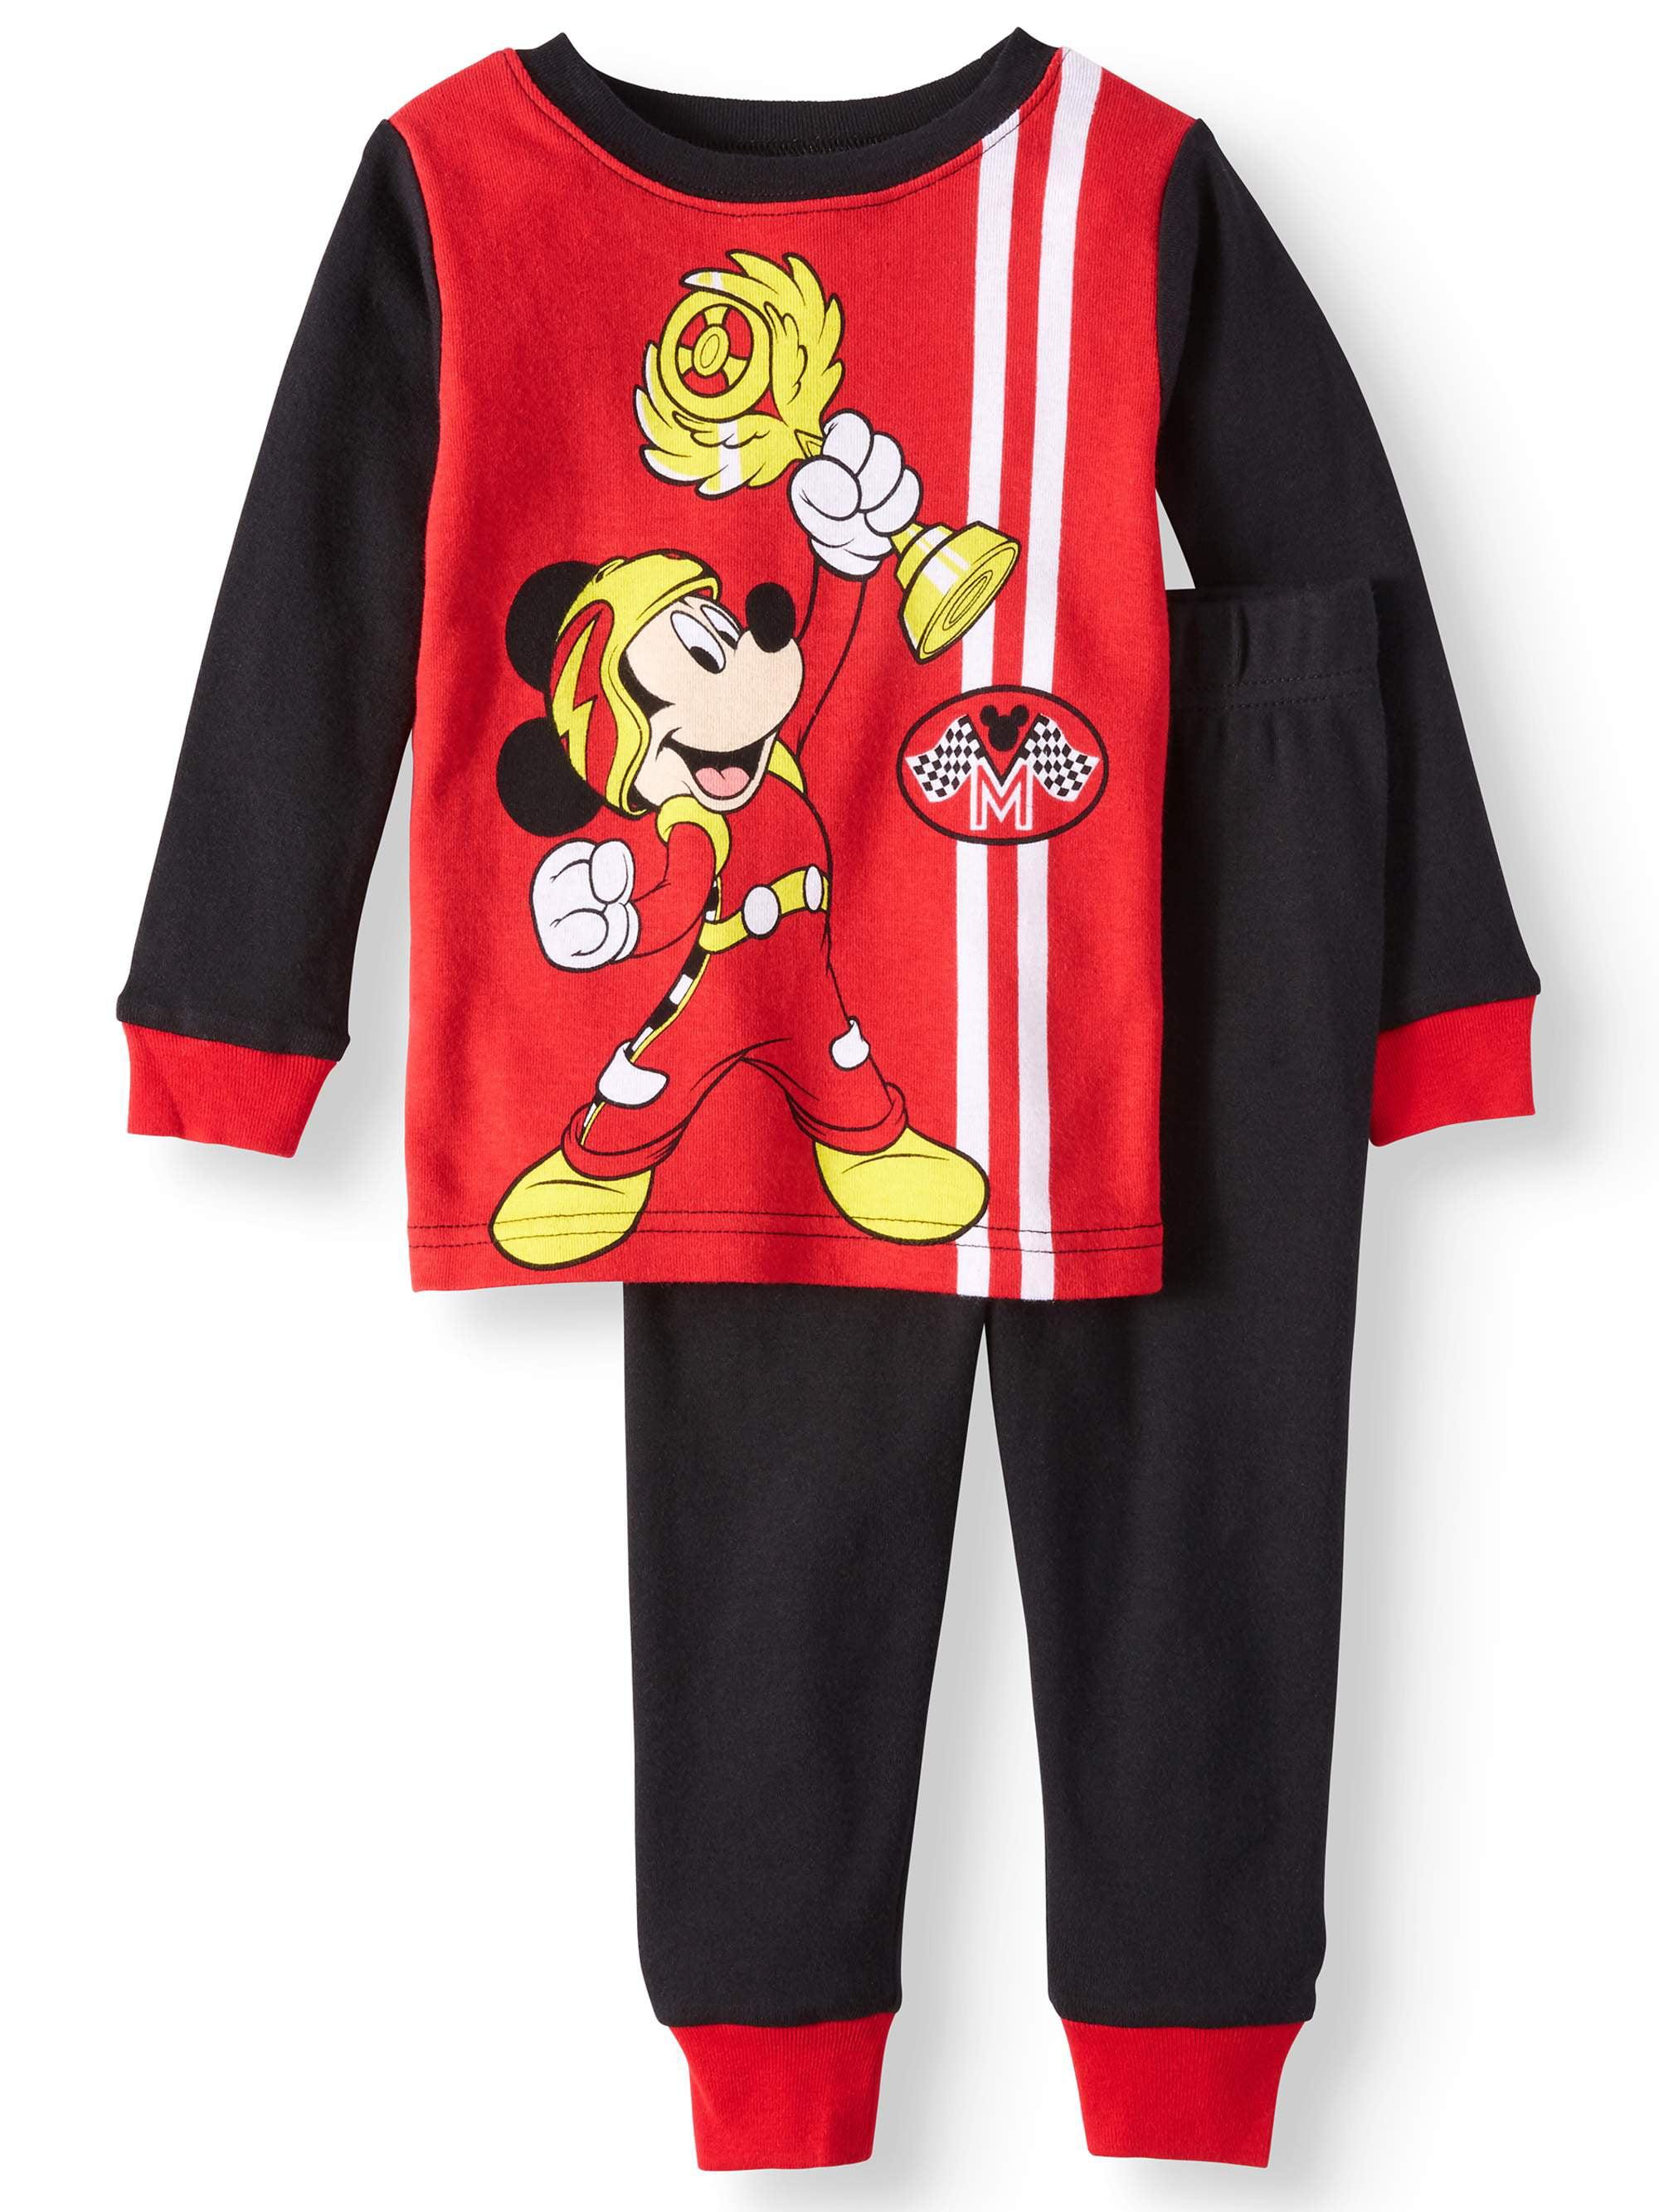 ff5f87b5 Mickey Mouse Pajamas, 2pc Set (Toddler Boys) – Walmart Inventory ...